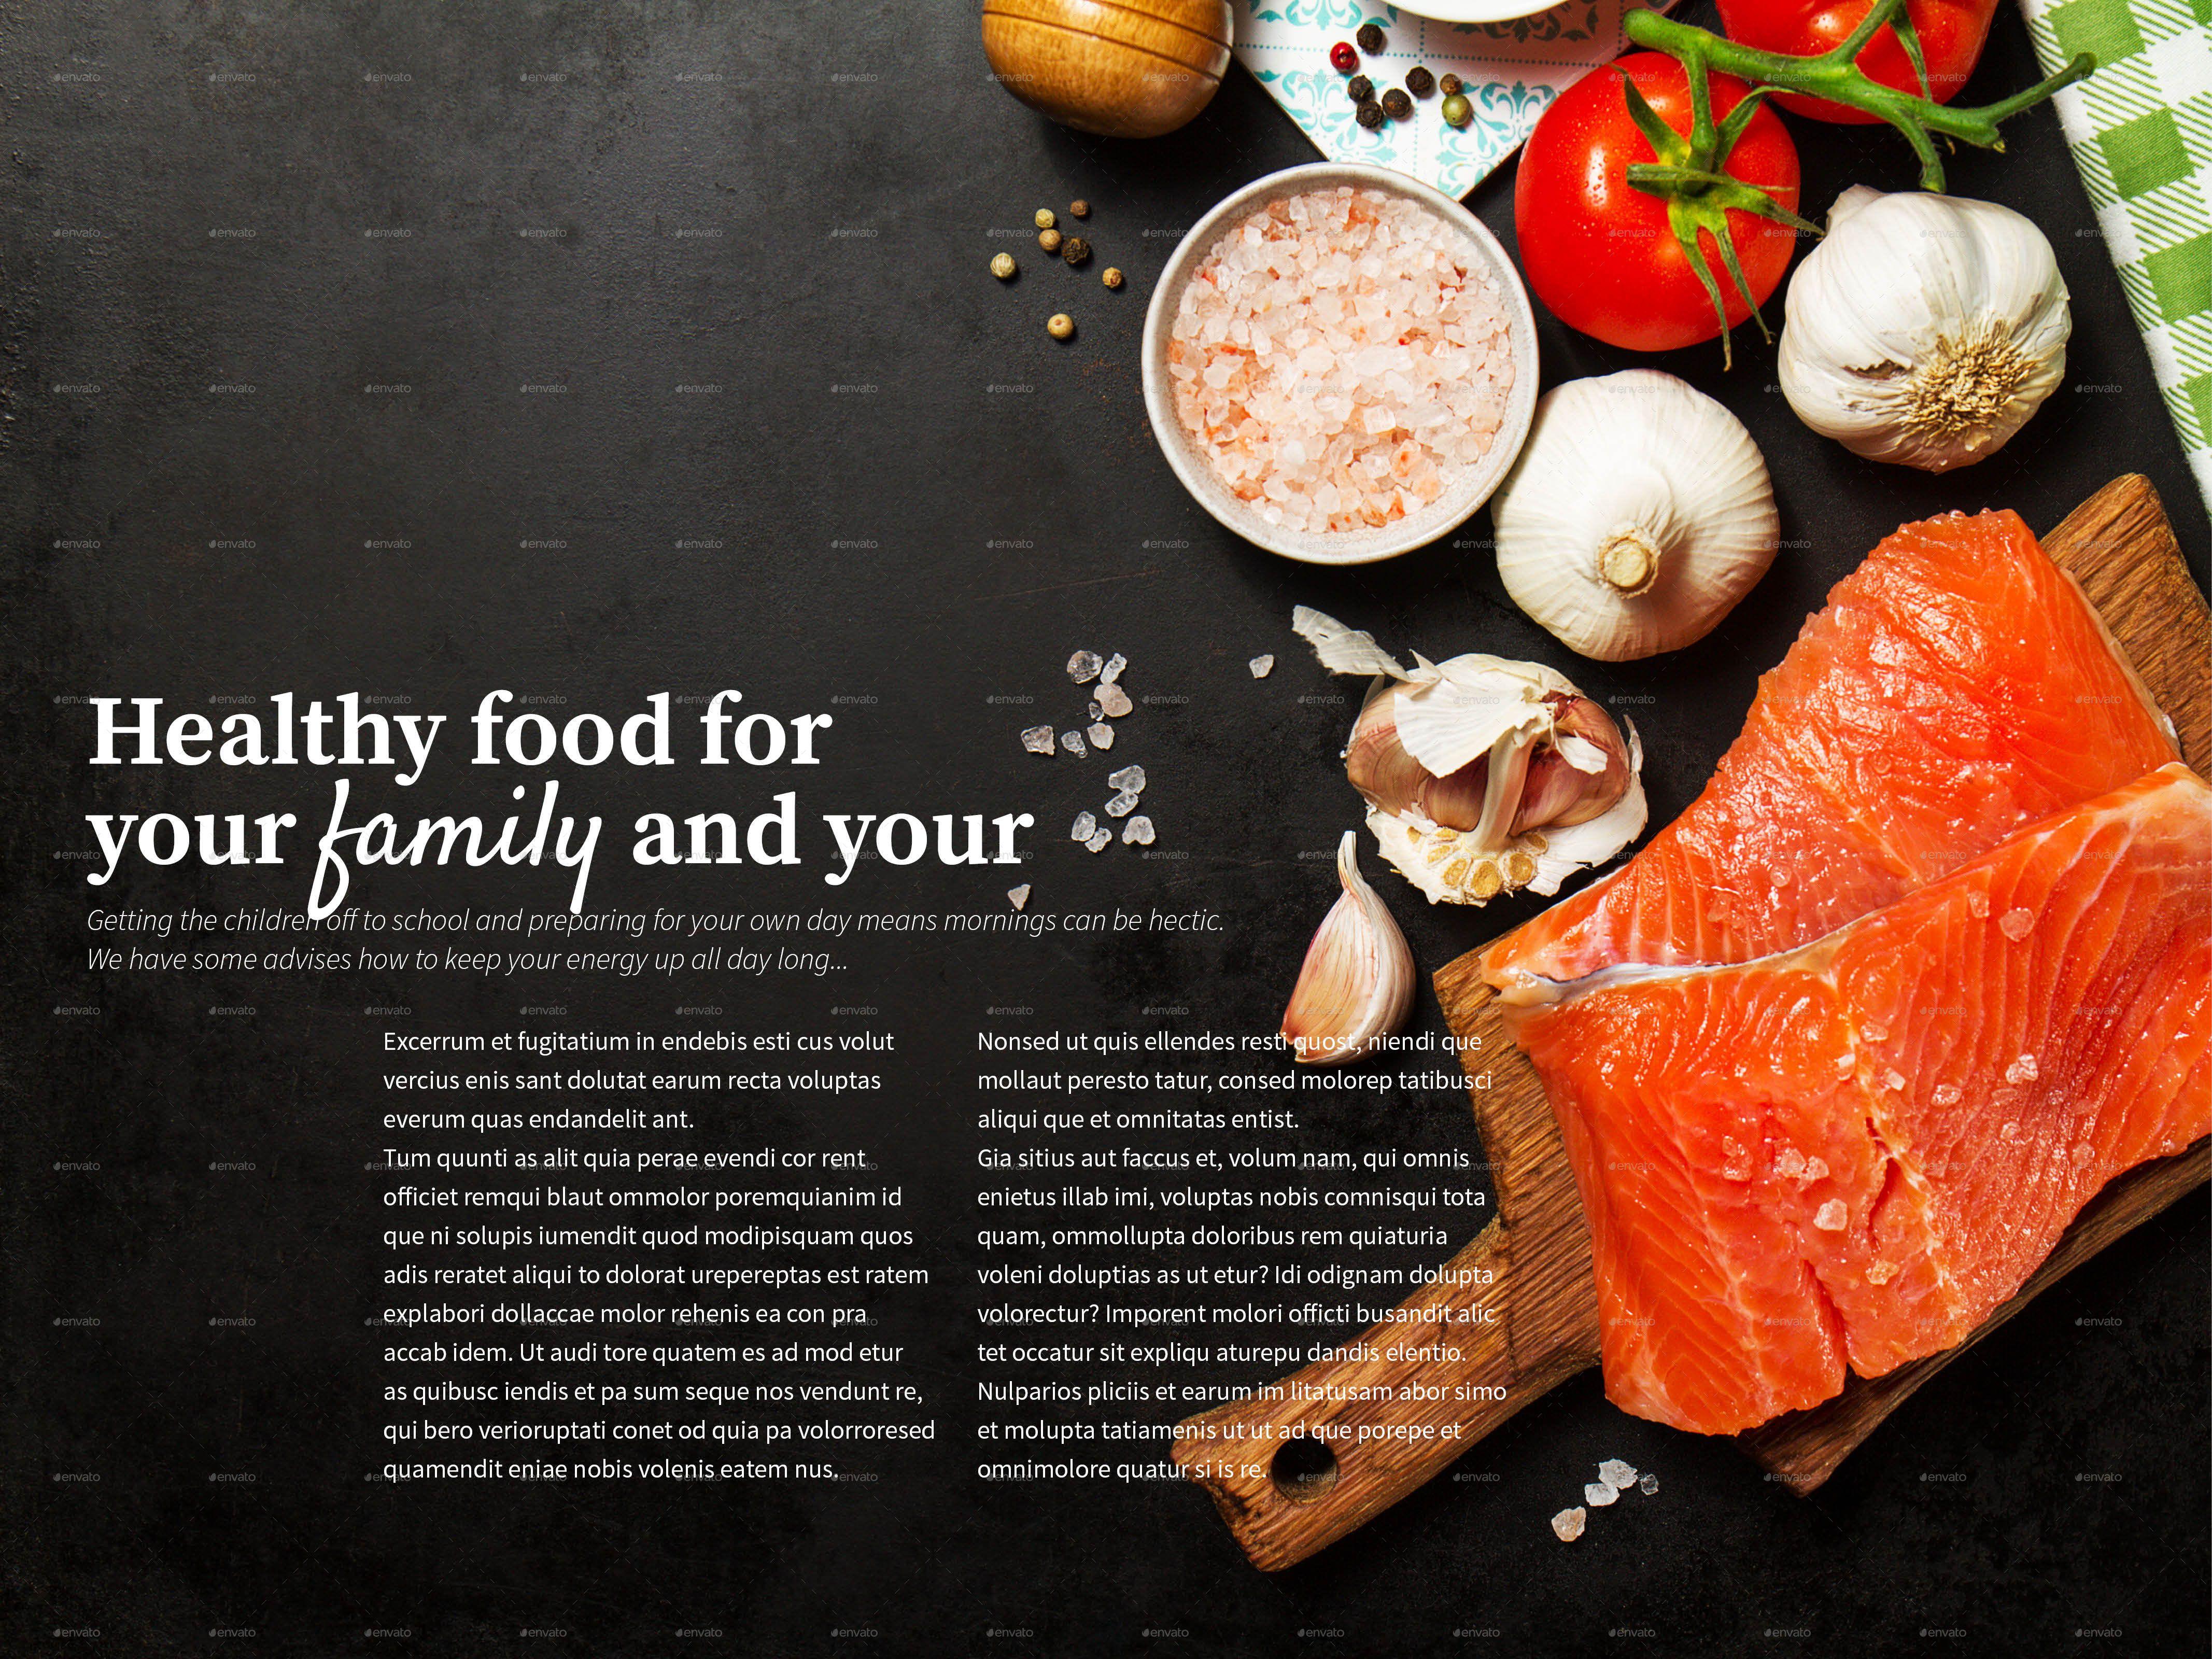 Cook Recipes Ebook Work It Pinterest Cookbook Template And - Ebook cookbook template